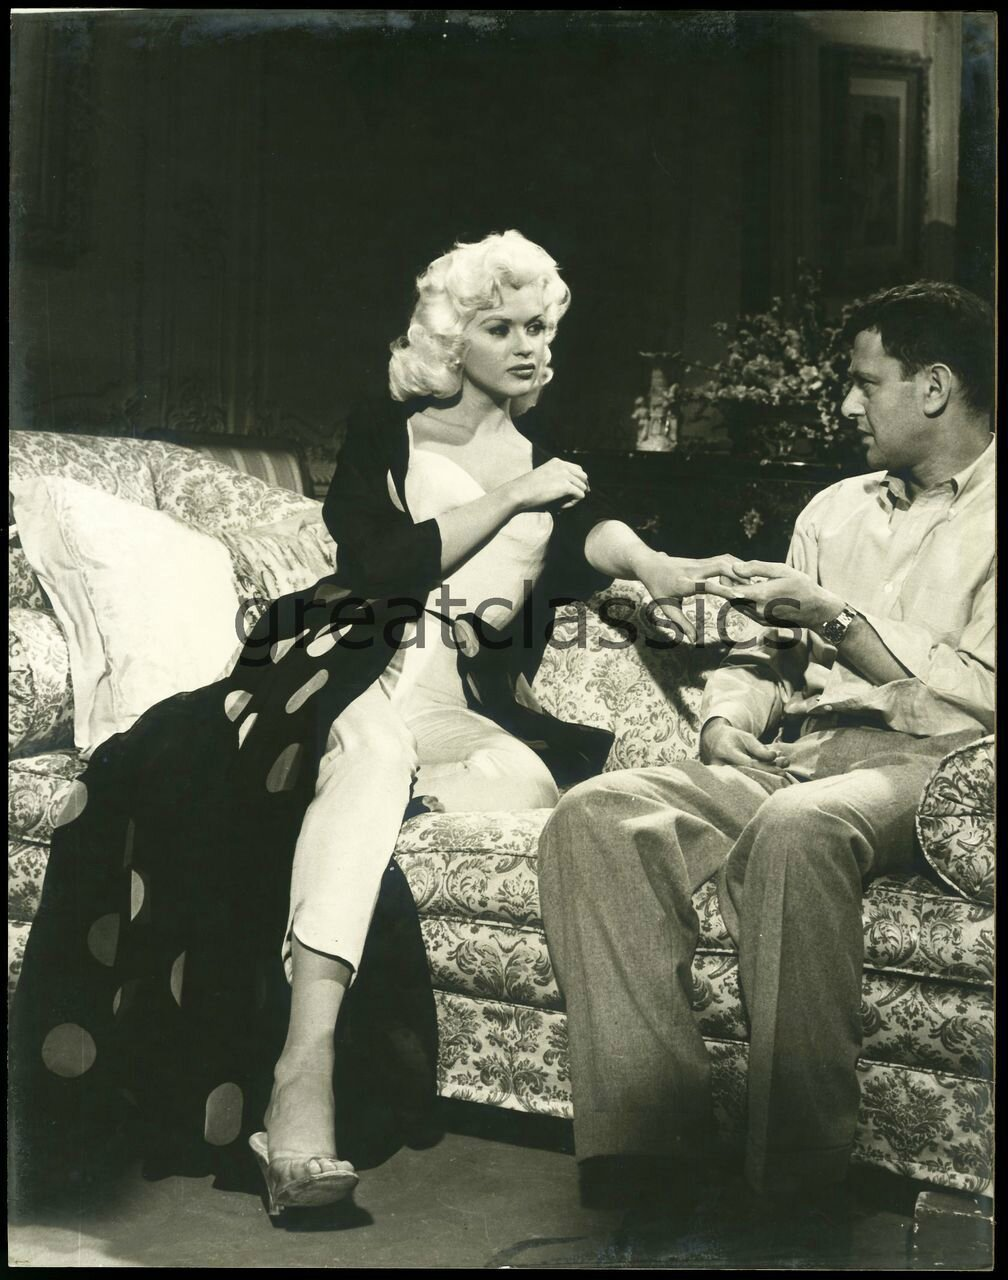 jayne-1957-film-will_success_spoil_rock_hunter-film-10-2